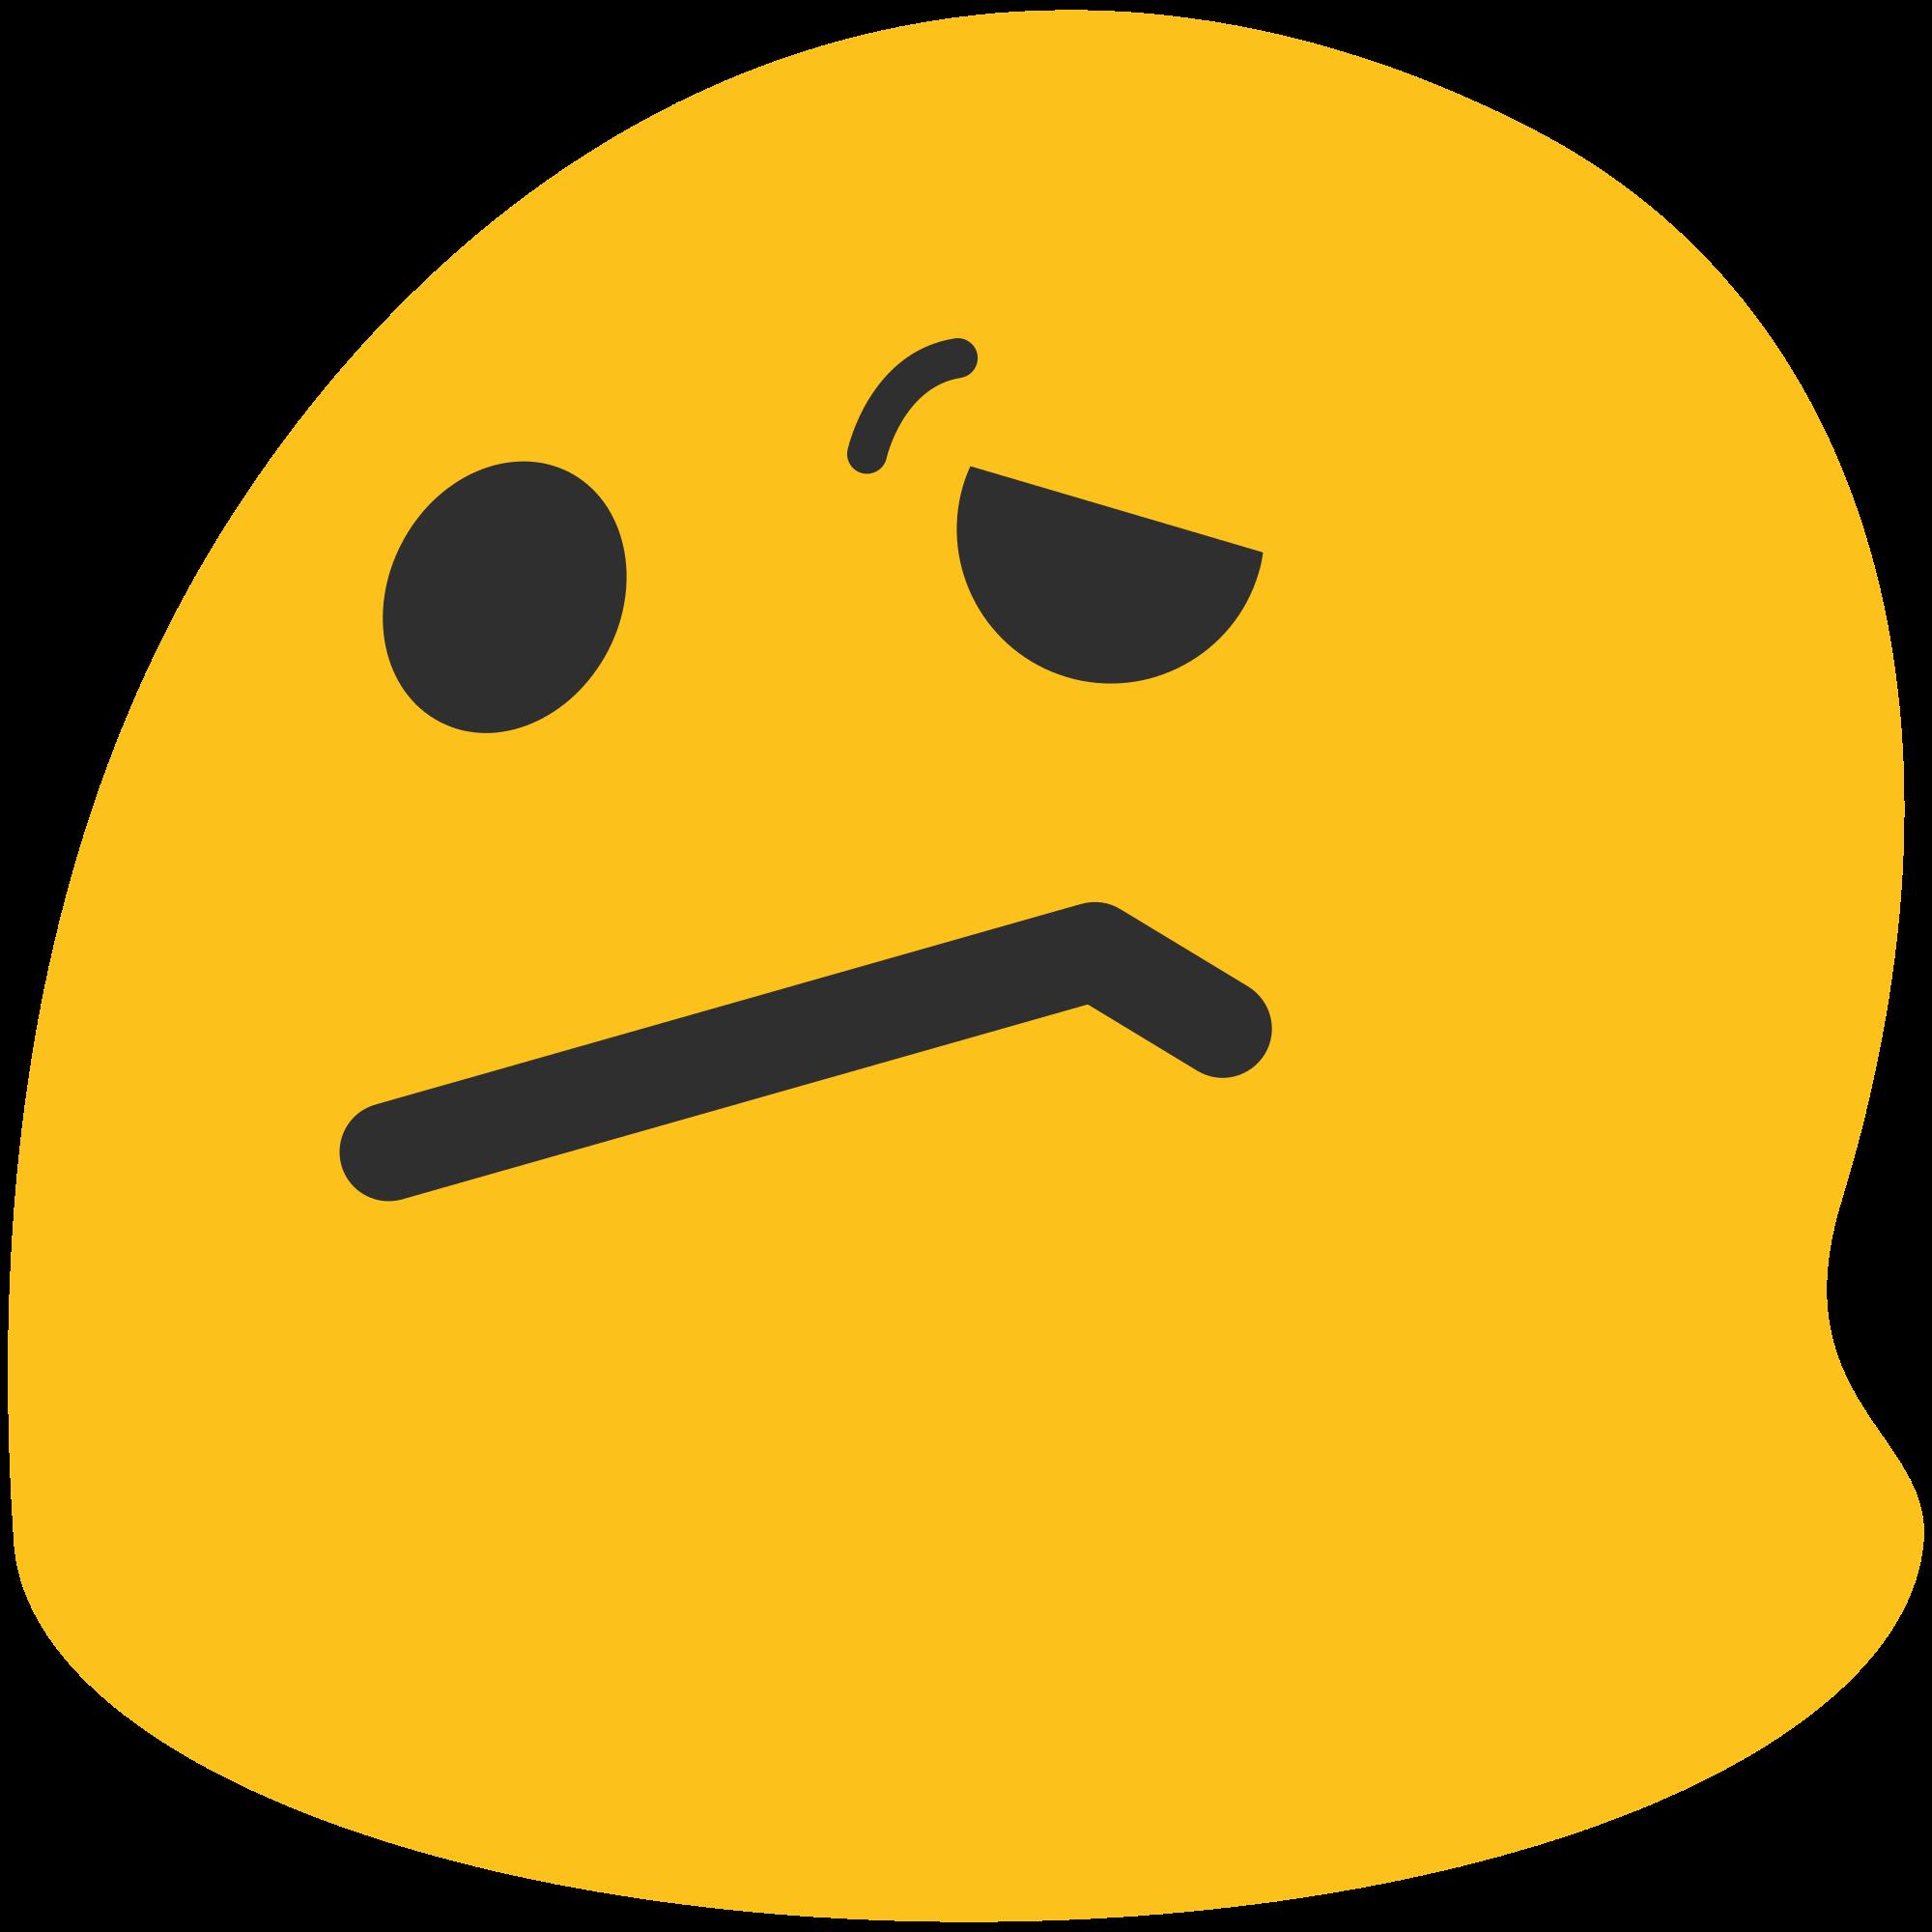 Google Emoji Internet Marketing Team